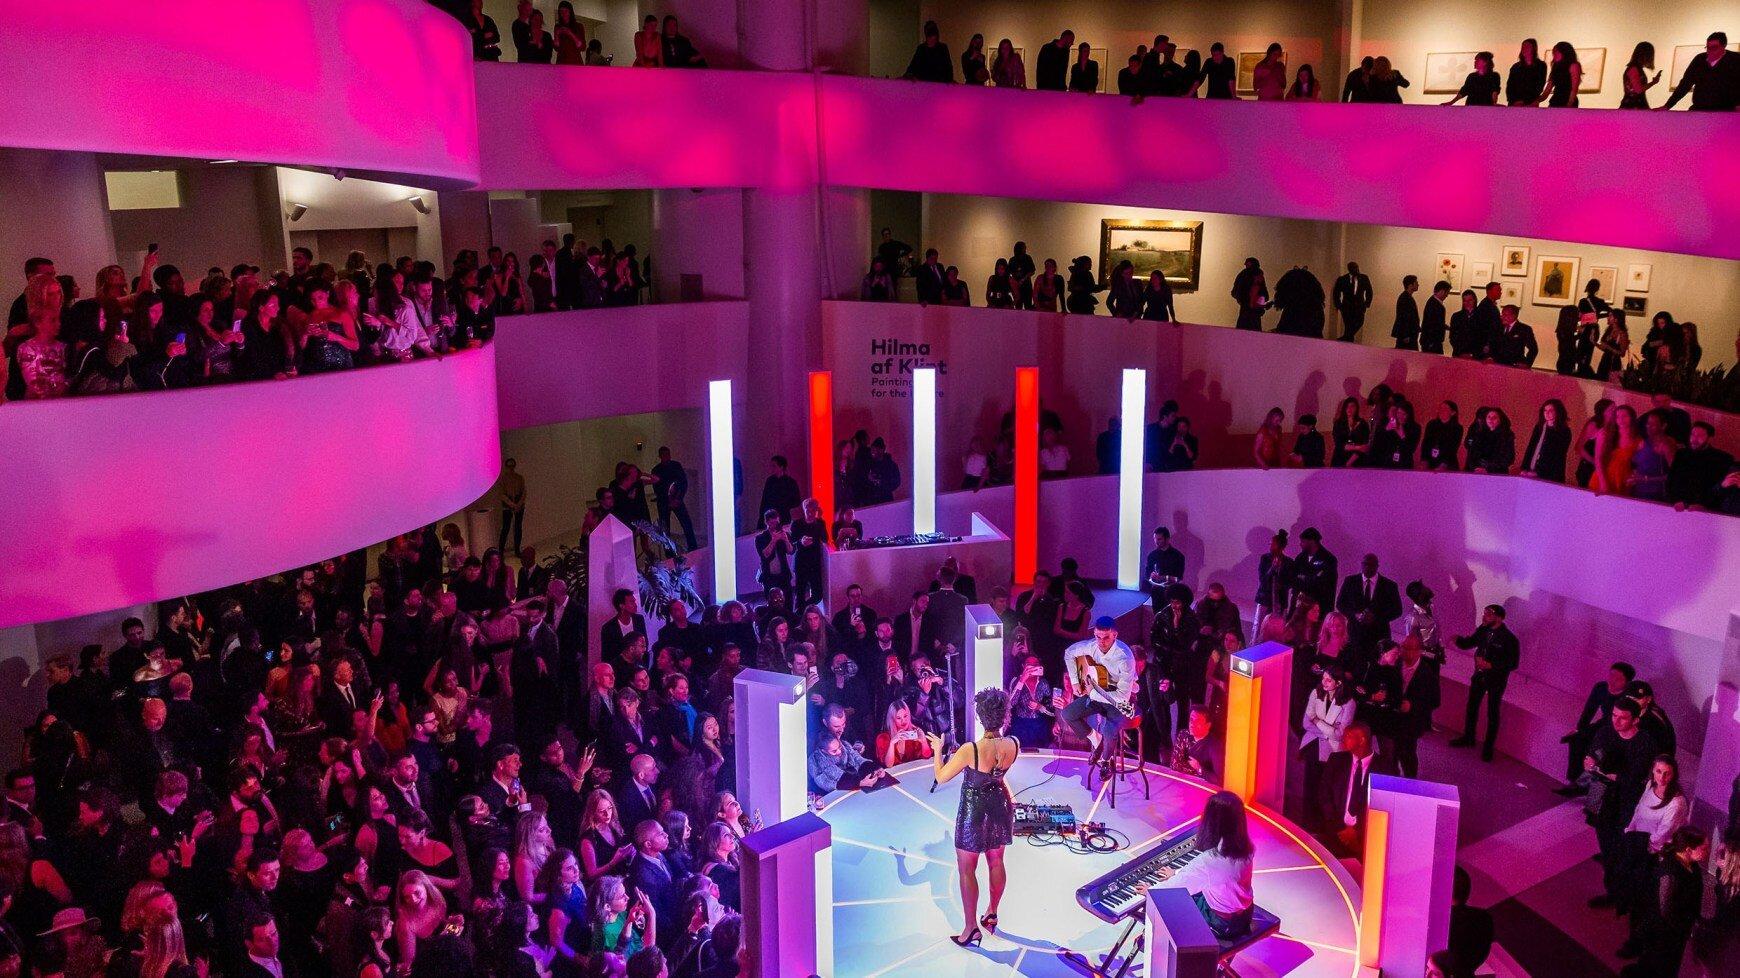 gen-event-guggenheim-international-gala-pre-party-2018-jorja-smith-16x9.jpg